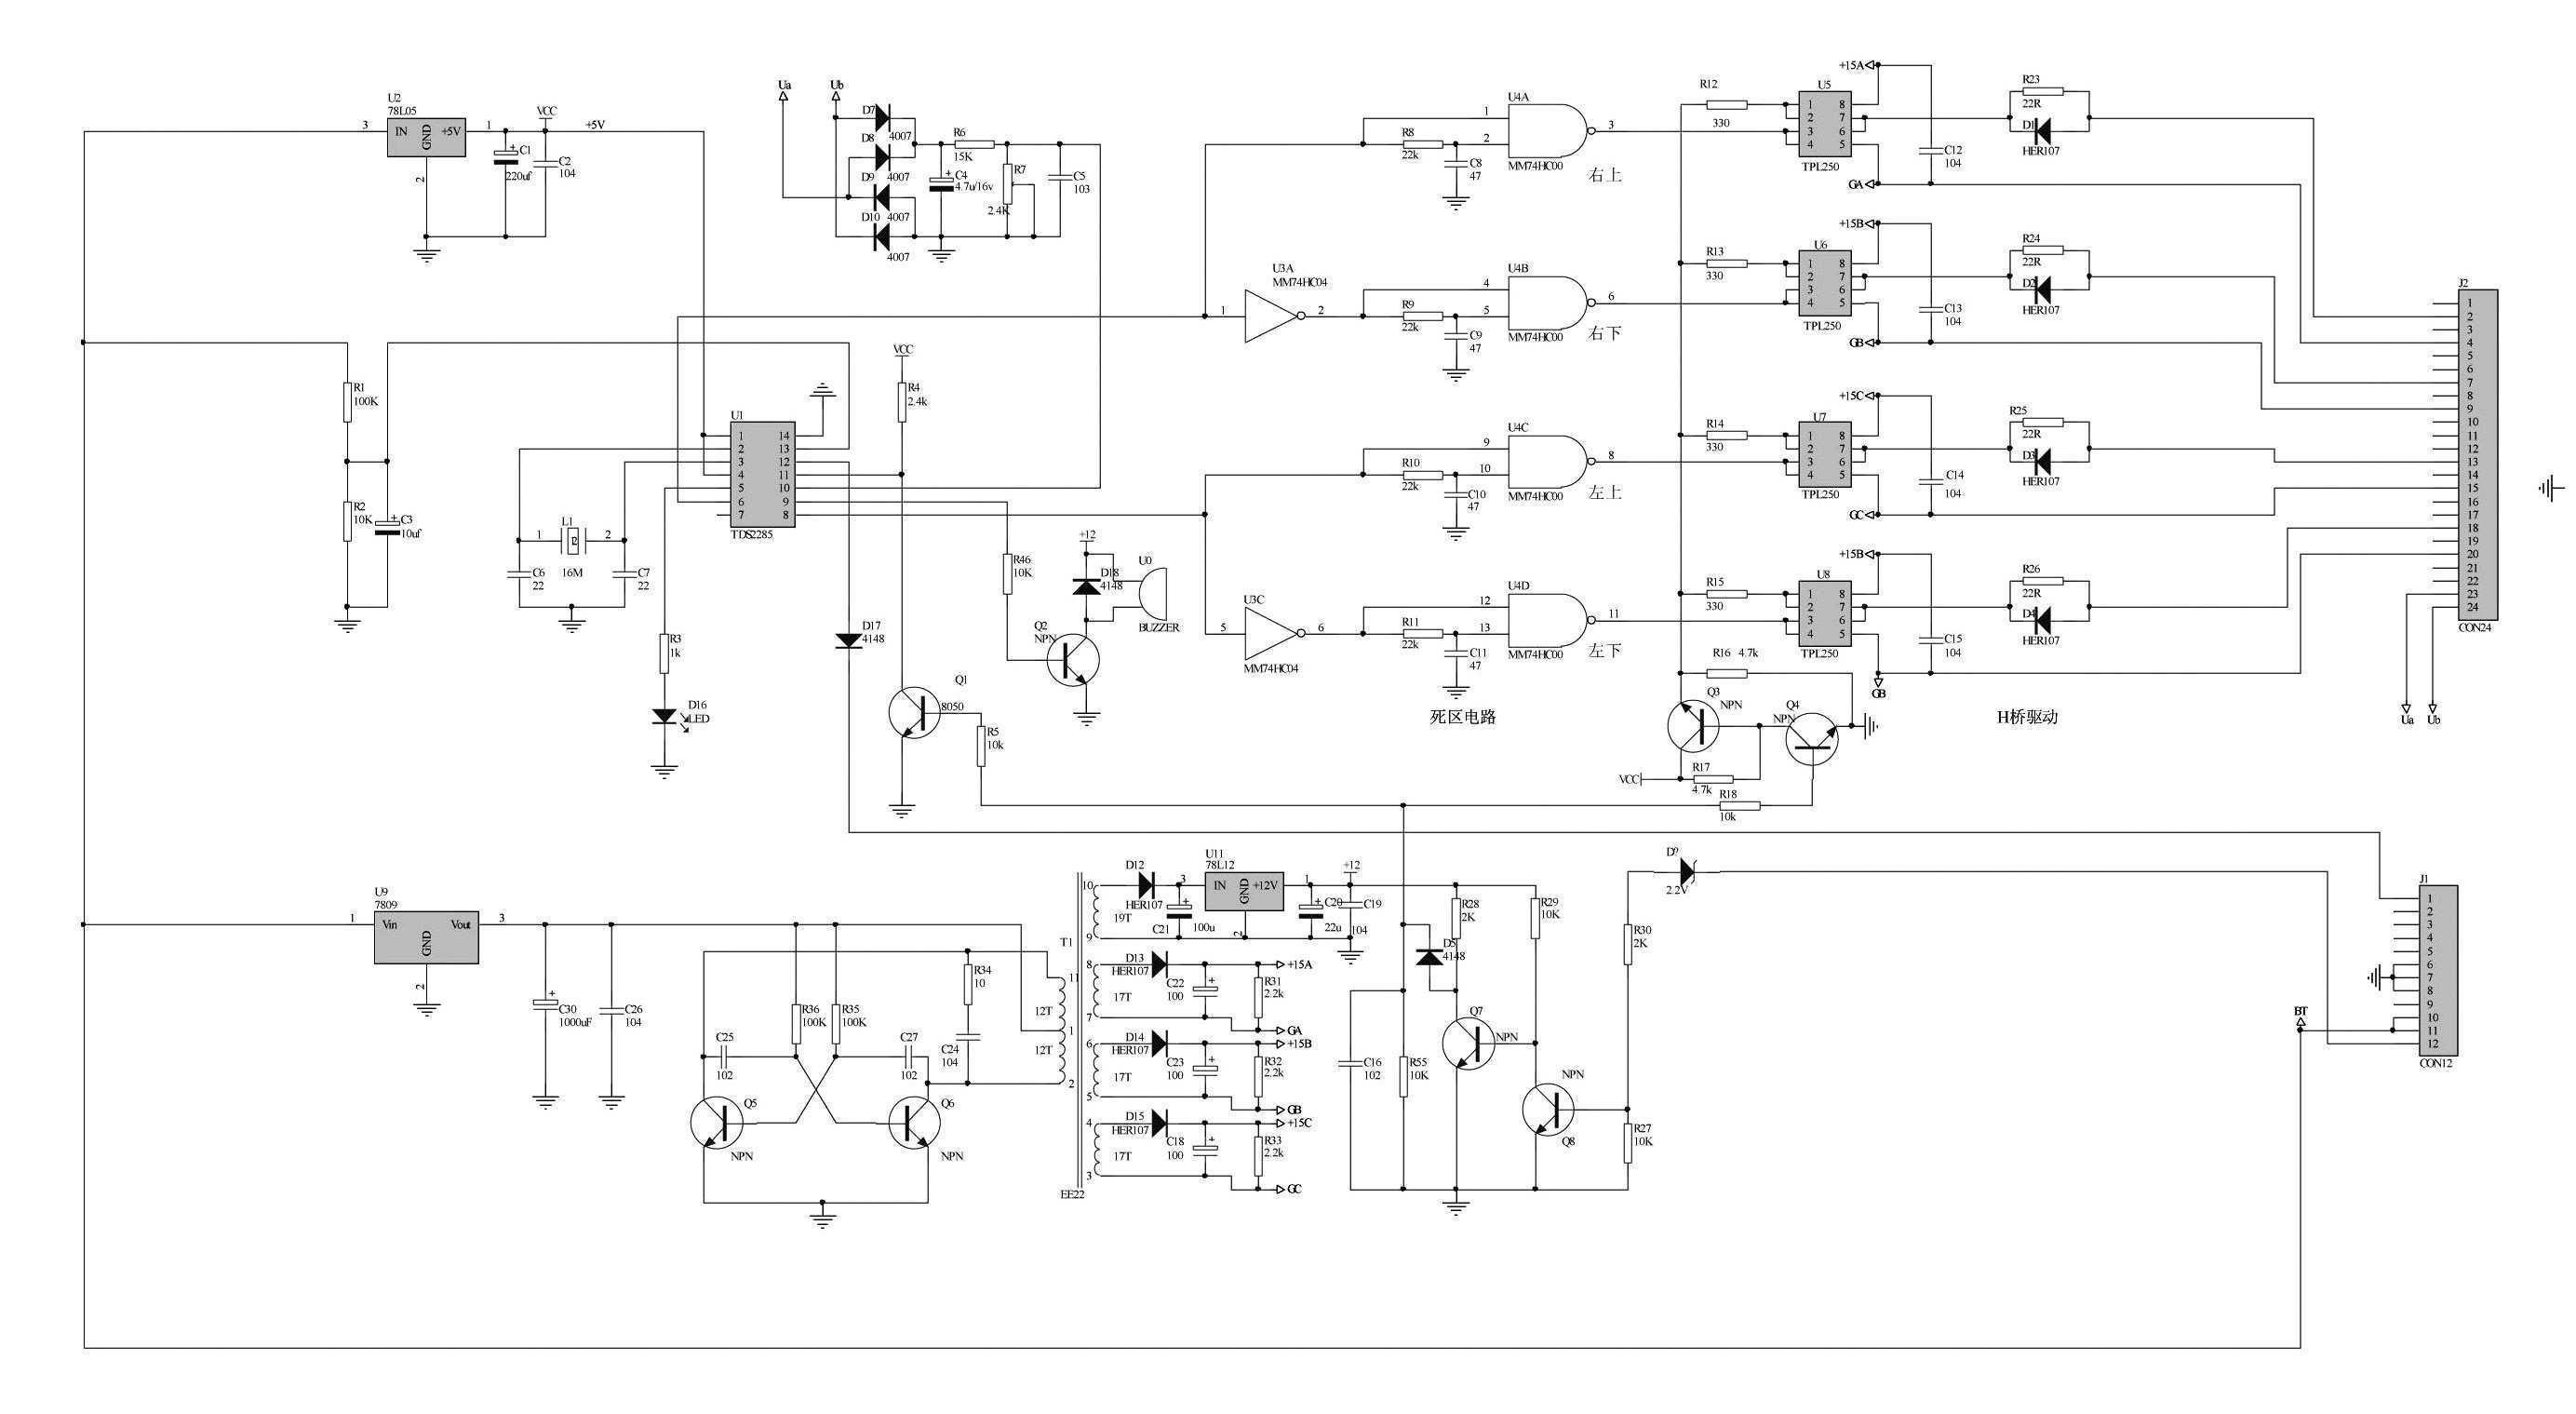 Mcdonnell Amp Miller Wf2 U 24 Wiring Diagram Free Ups Circuit Schematic 5k